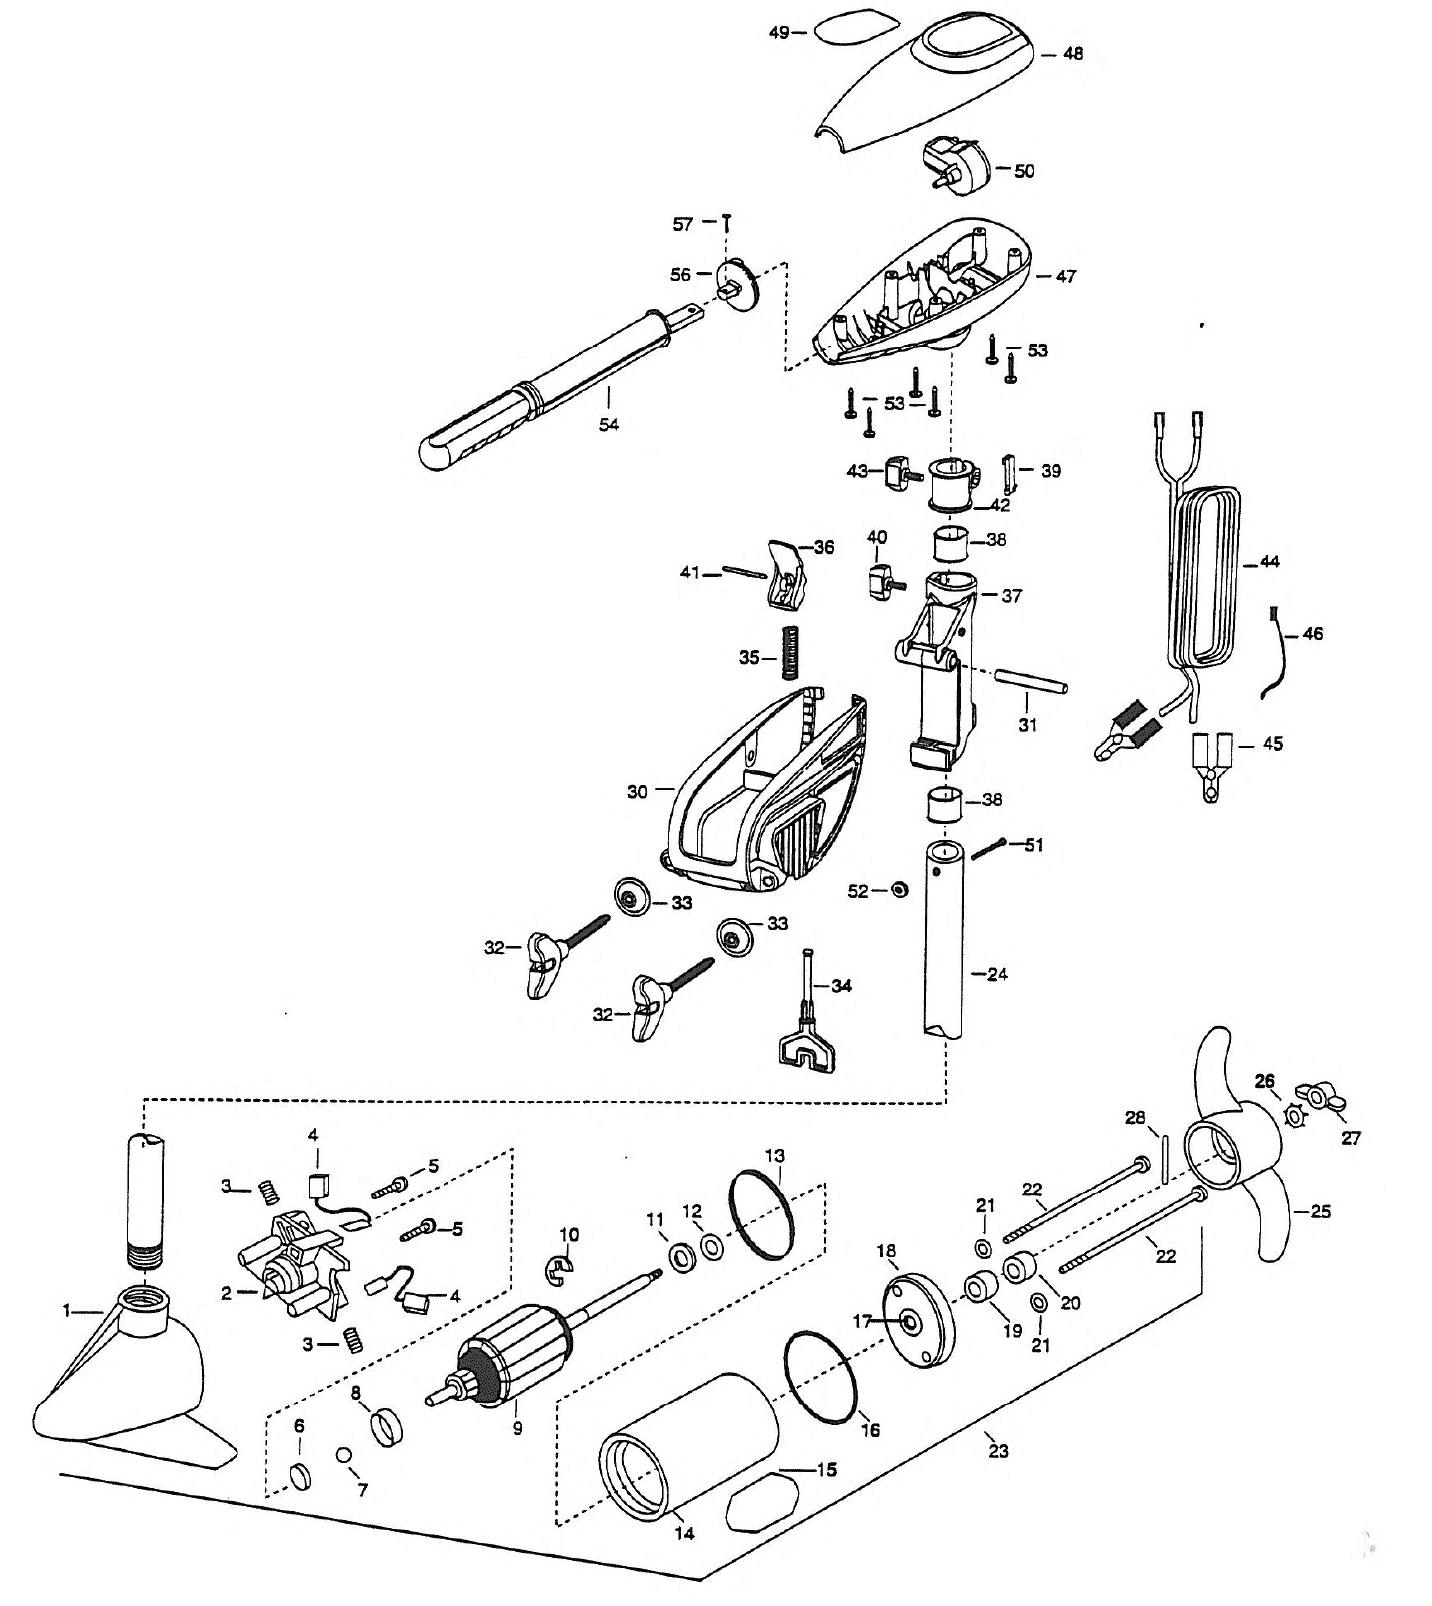 wiring up a jon boat